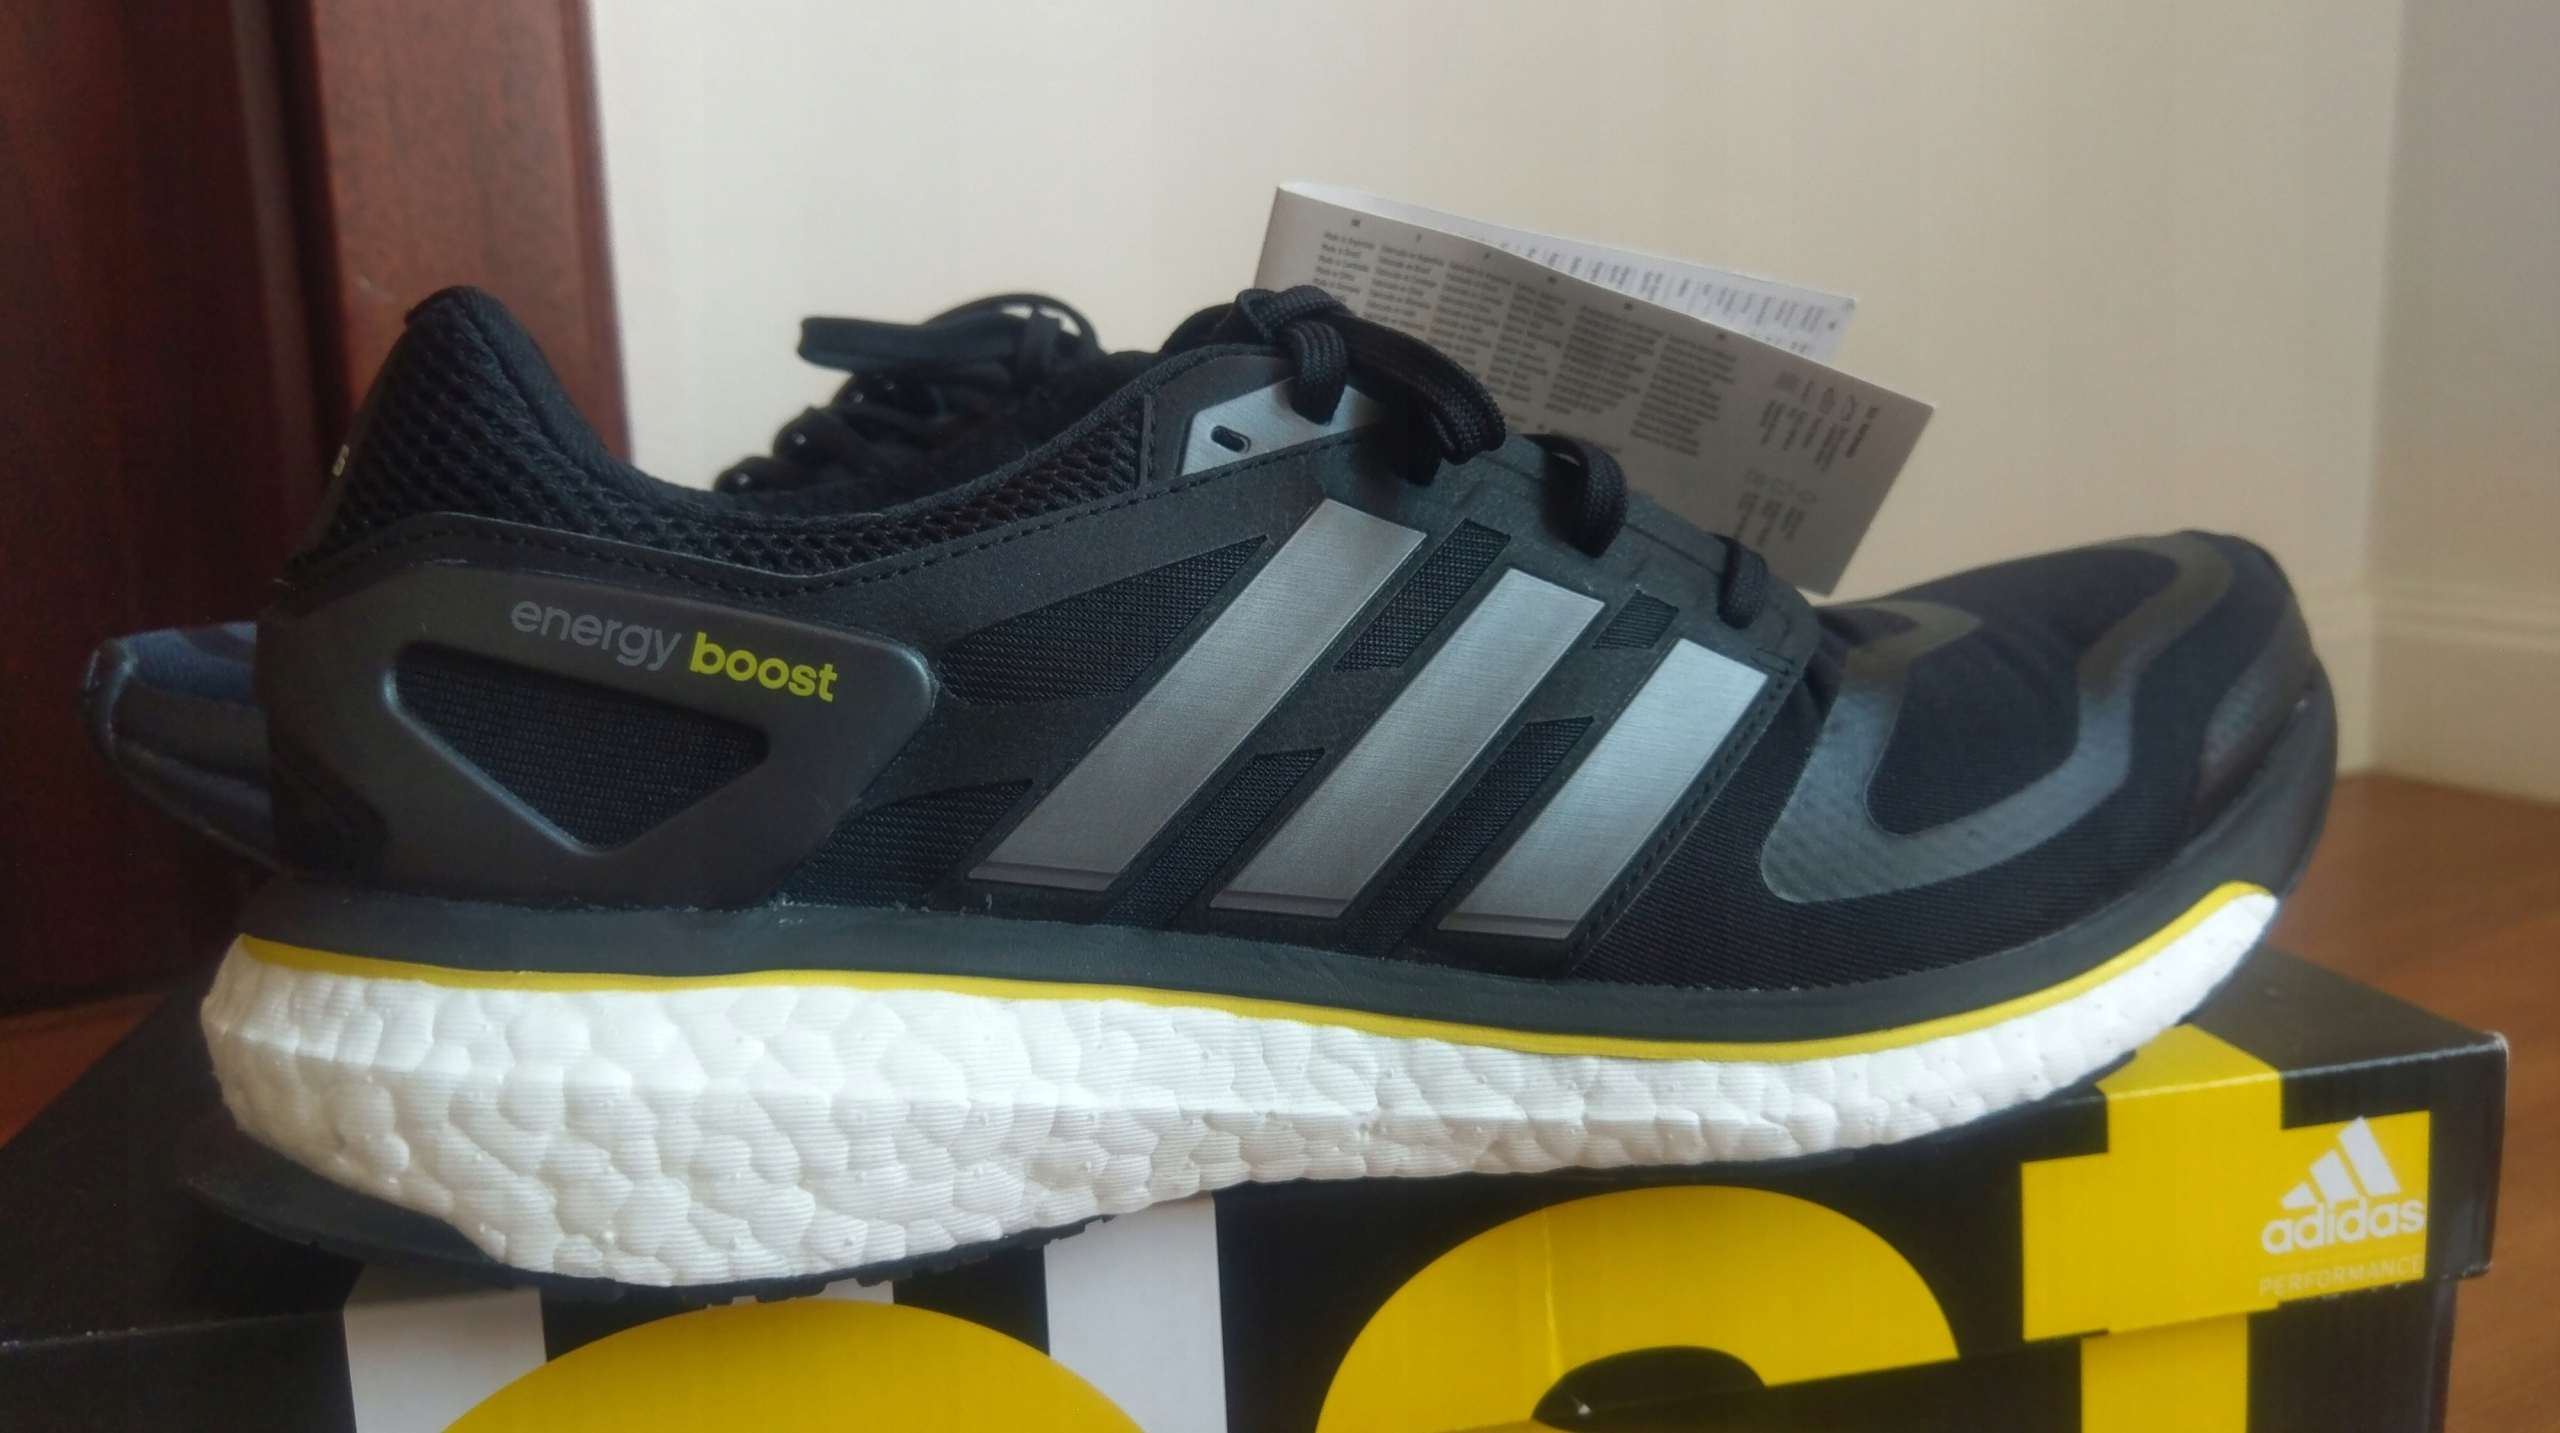 new product 4f0ca 0f8cb Adidas Energy Boost G64392 black (nie Ultraboost)